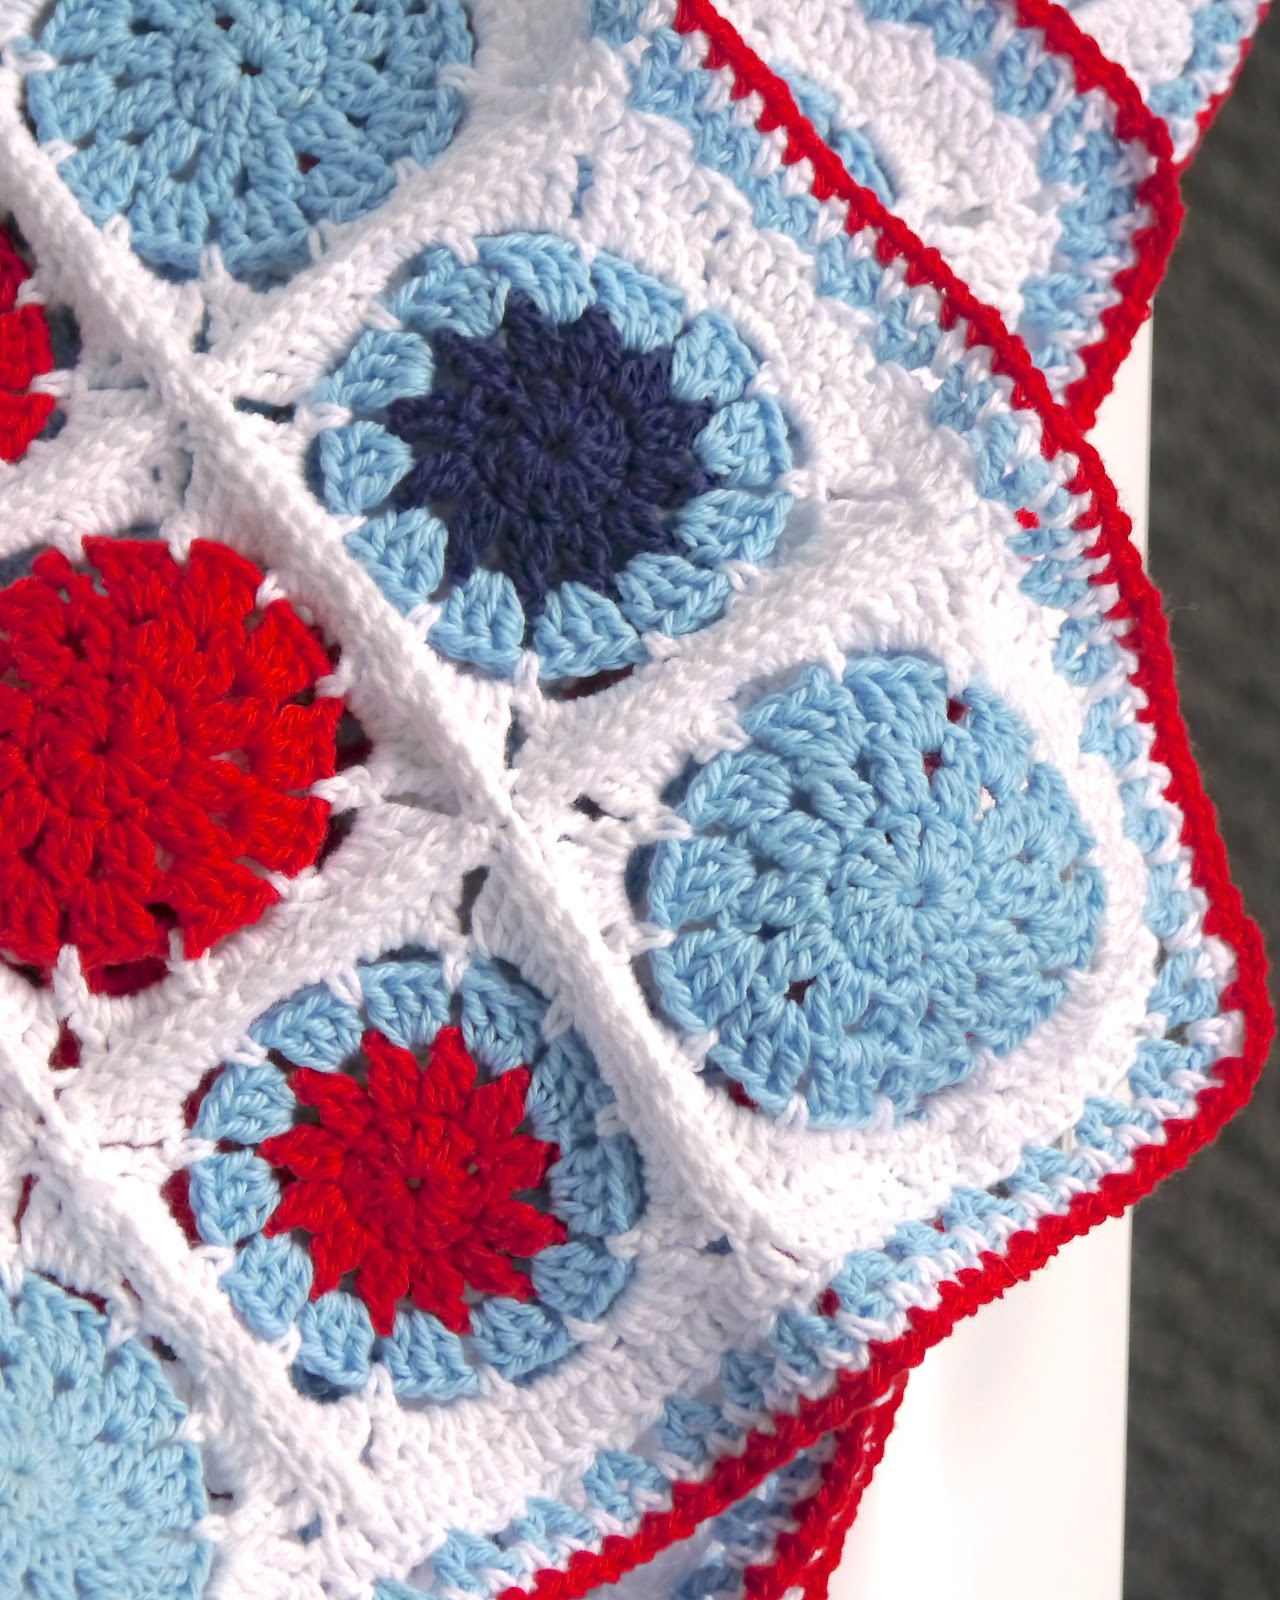 Crochet Baby Blanket Cotton Pattern : Sarita creative: Make it // Crochet Cotton Baby Blanket ...